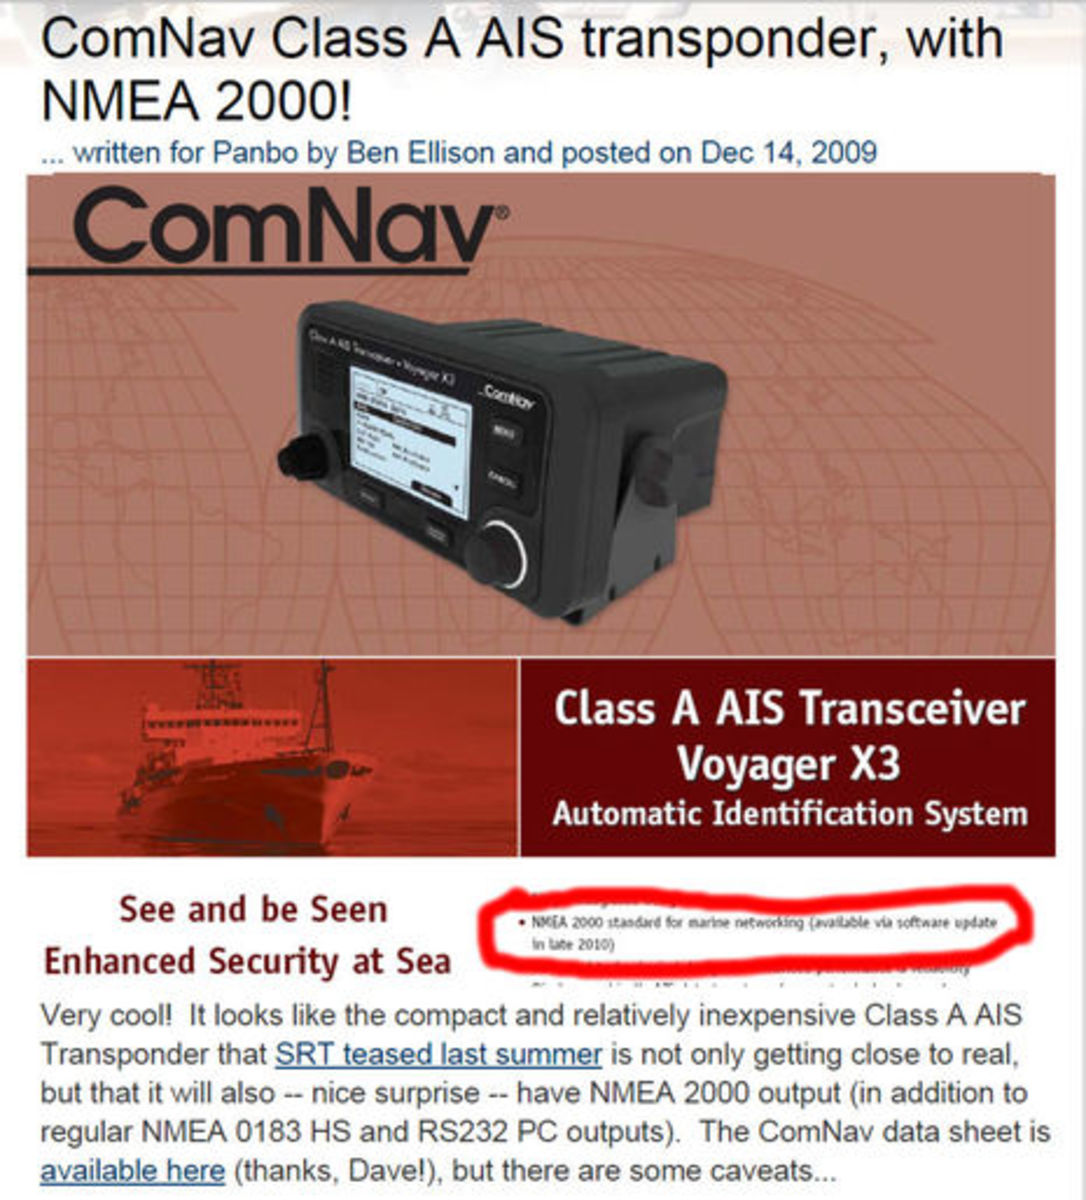 ComNav_Voyager_X3_AIS_w_NMEA_2000_NOT_cPanbo.jpg